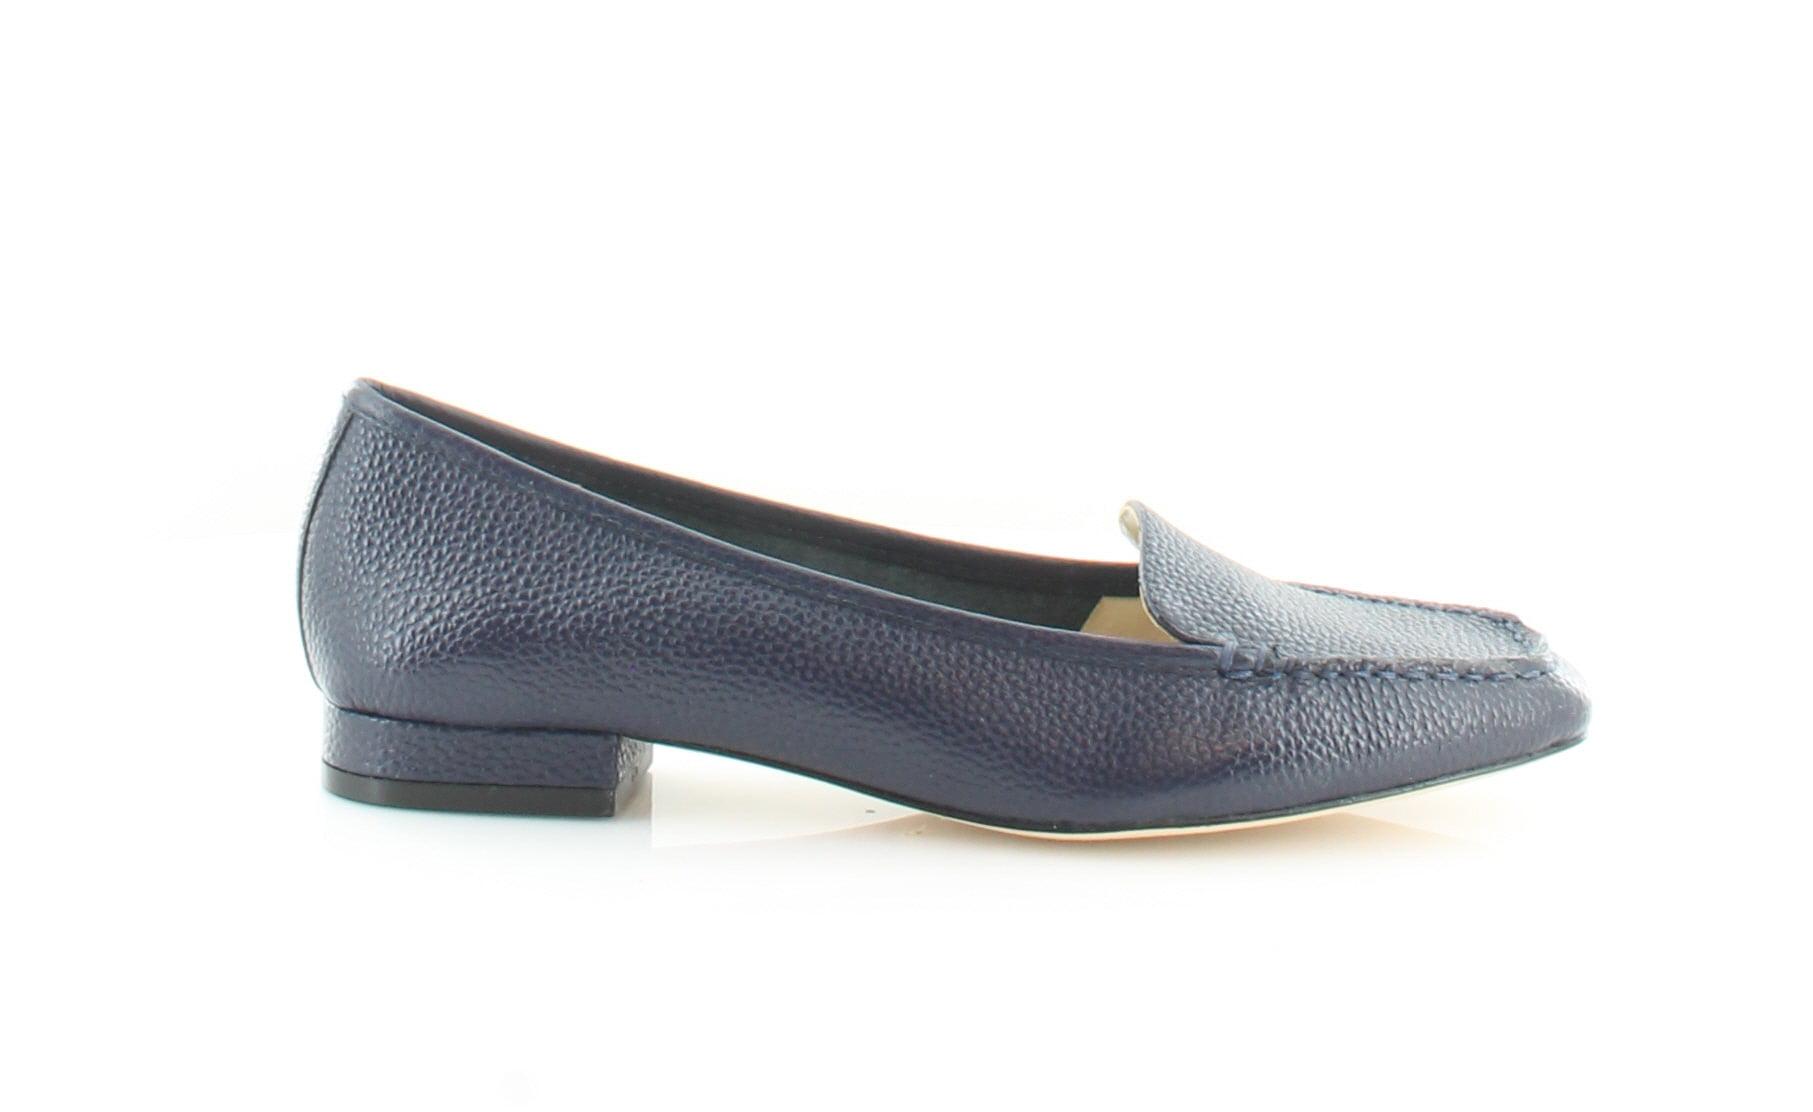 Bettye Muller Valet Women's Flats & Oxfords